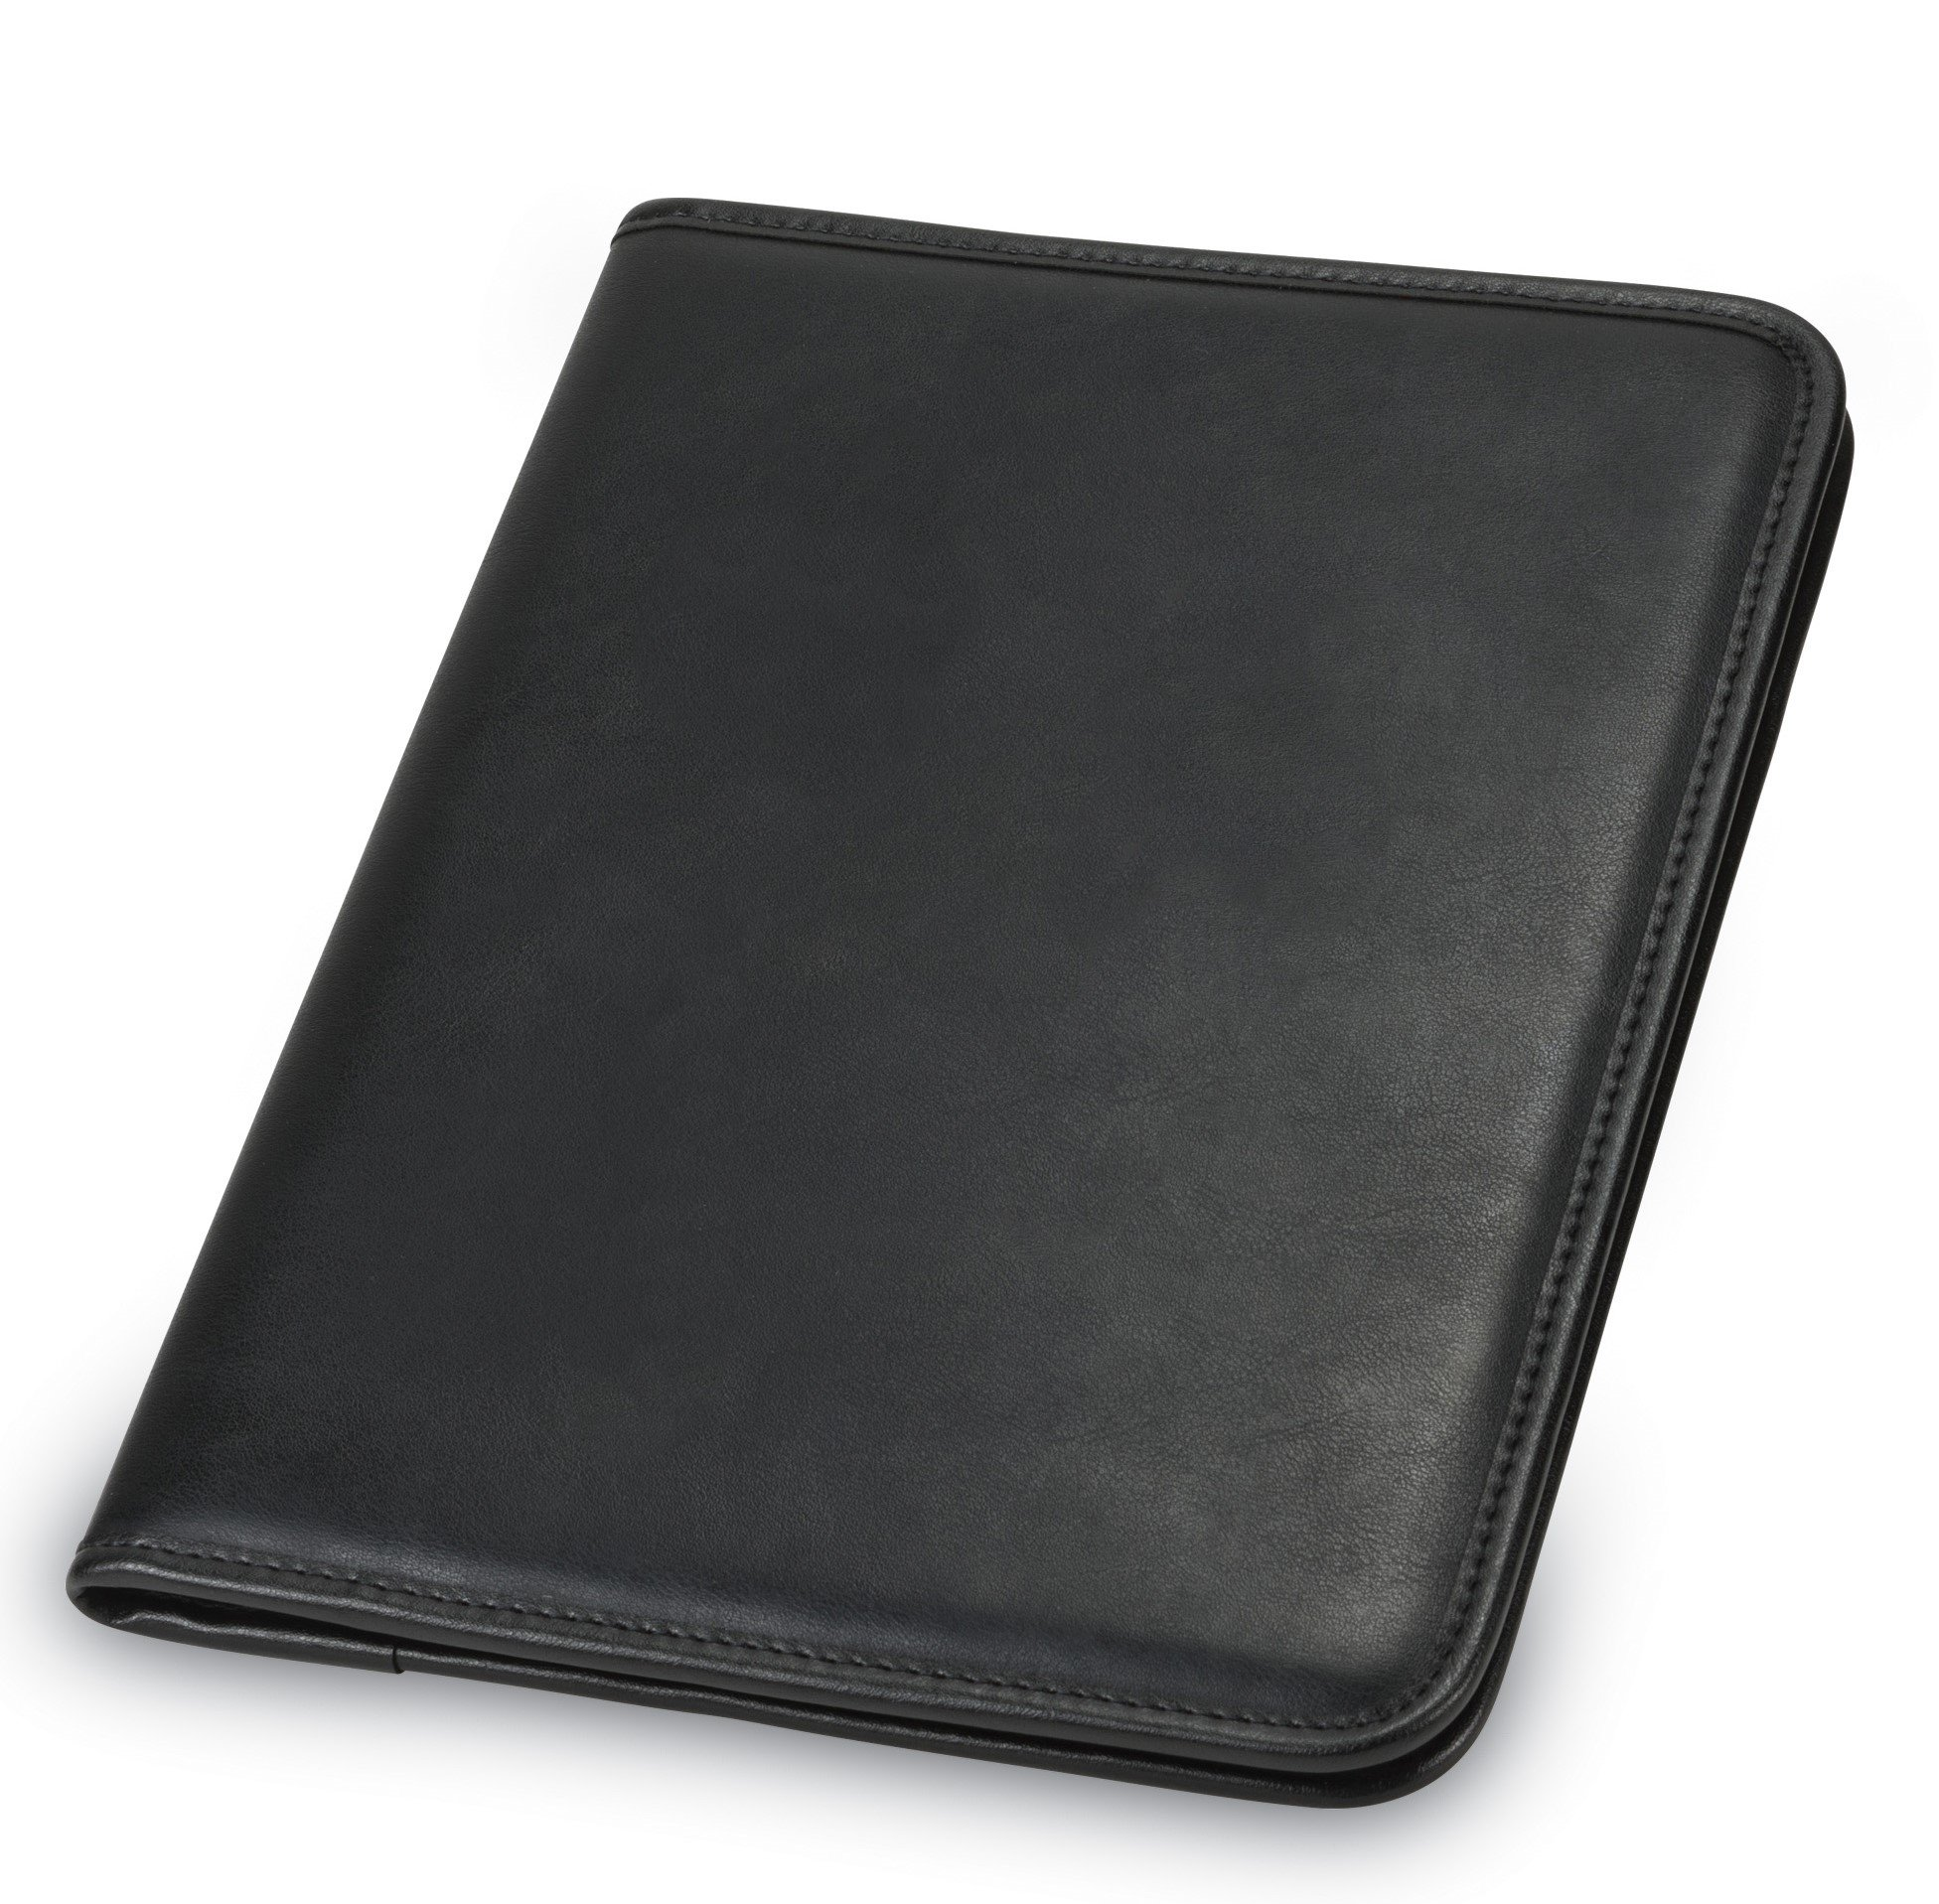 Samsill Professional Padfolio Portfolio Business